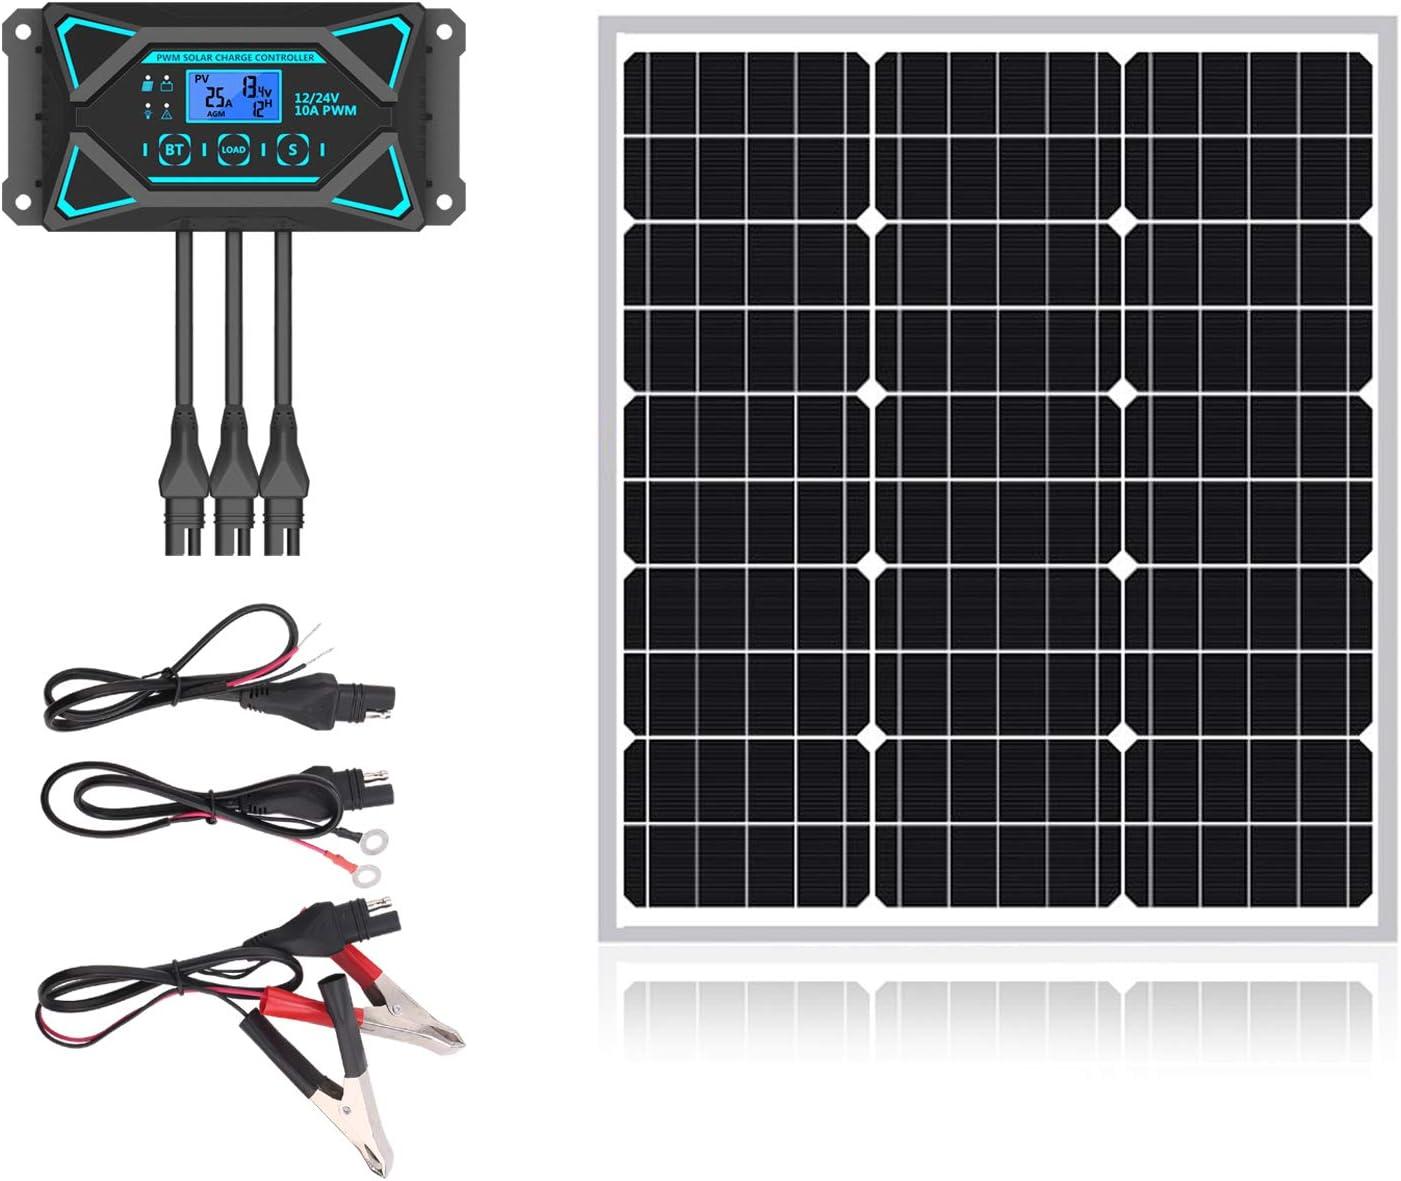 20W 12V Max 72% OFF Solar Panel Kits- 12 Watt Crystalline 20 outlet Mono Volt